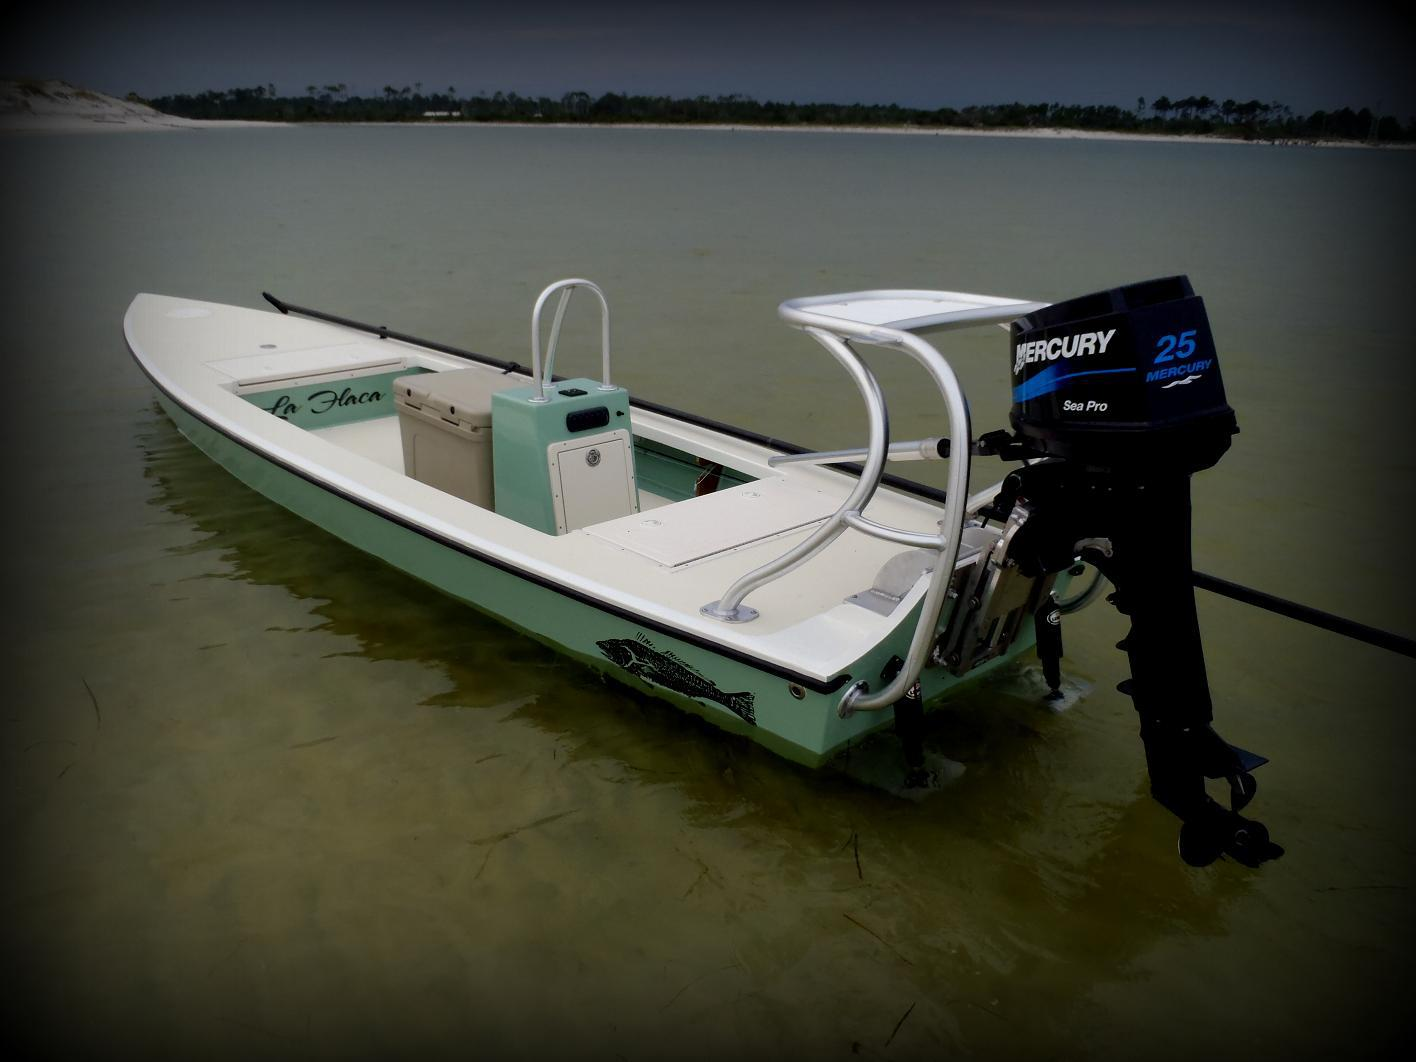 Poling Platform on Jon Boat